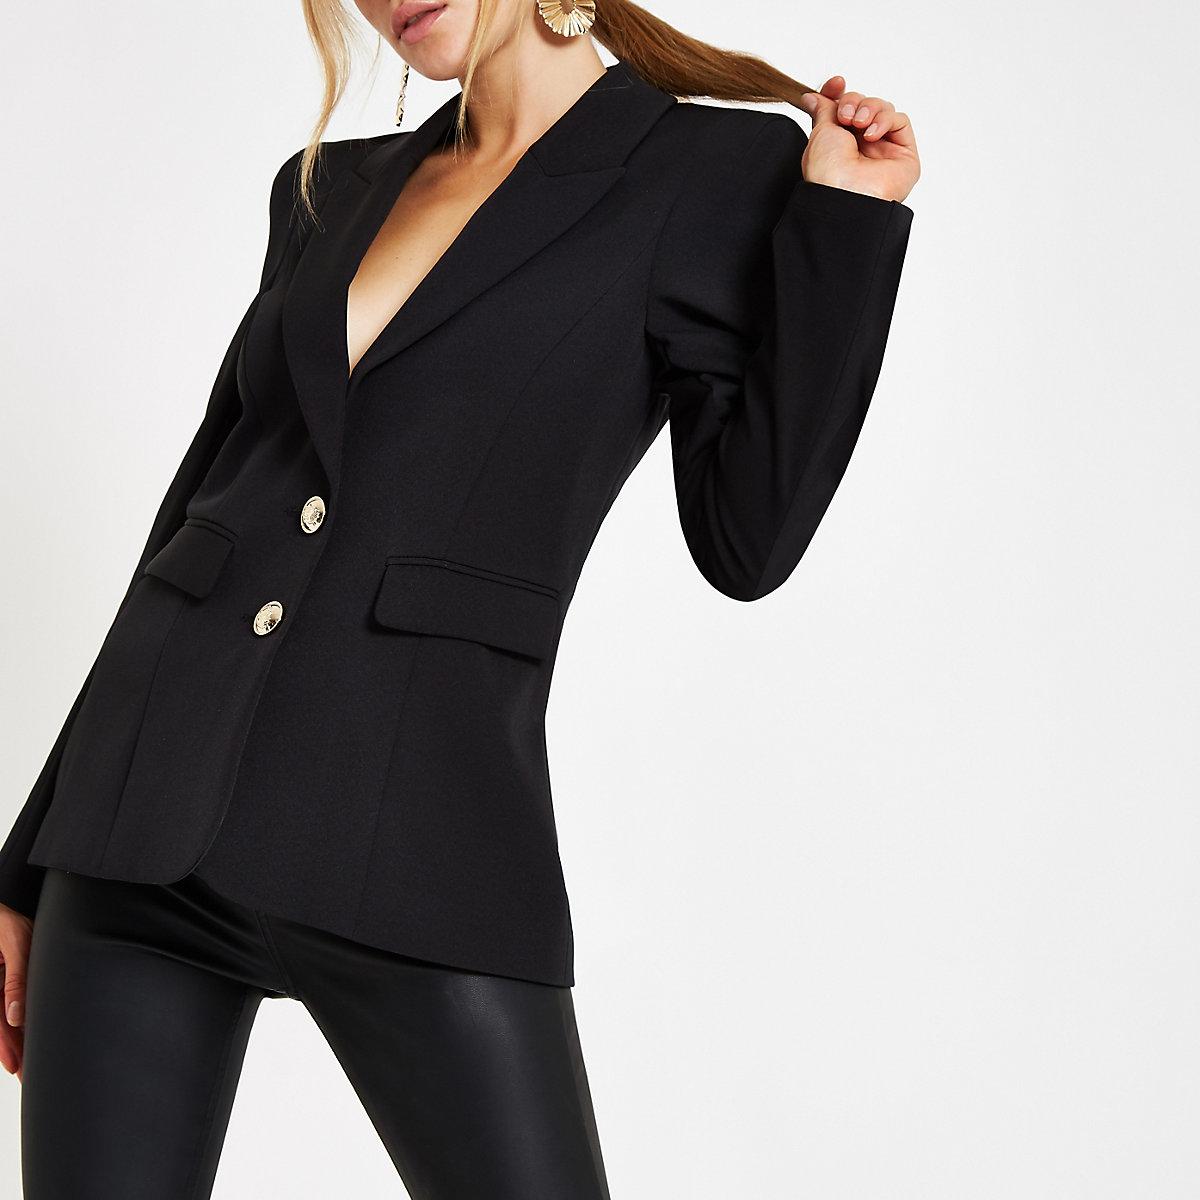 Black button front ponte long sleeve blazer